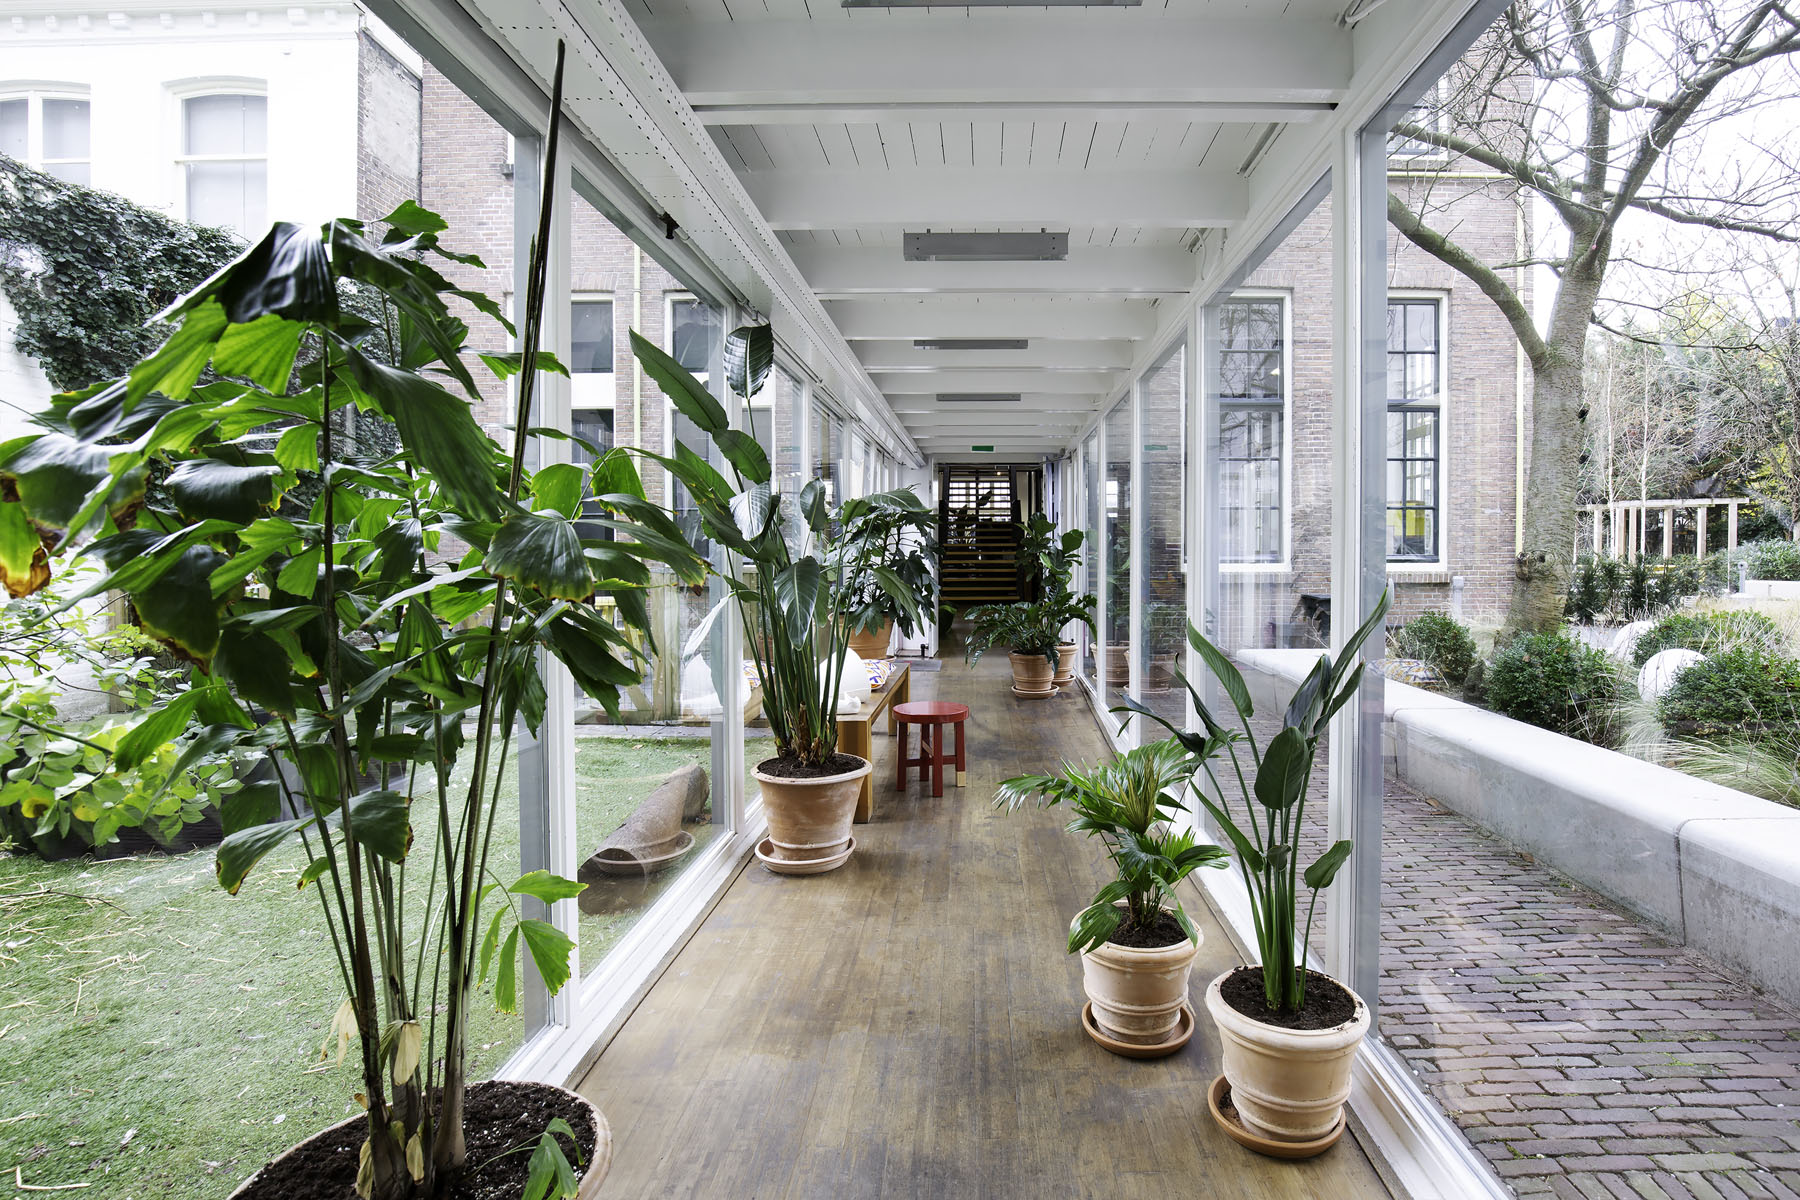 Freedom-Lab-Amsterdam-Jeroen-Machielsen-8.jpg